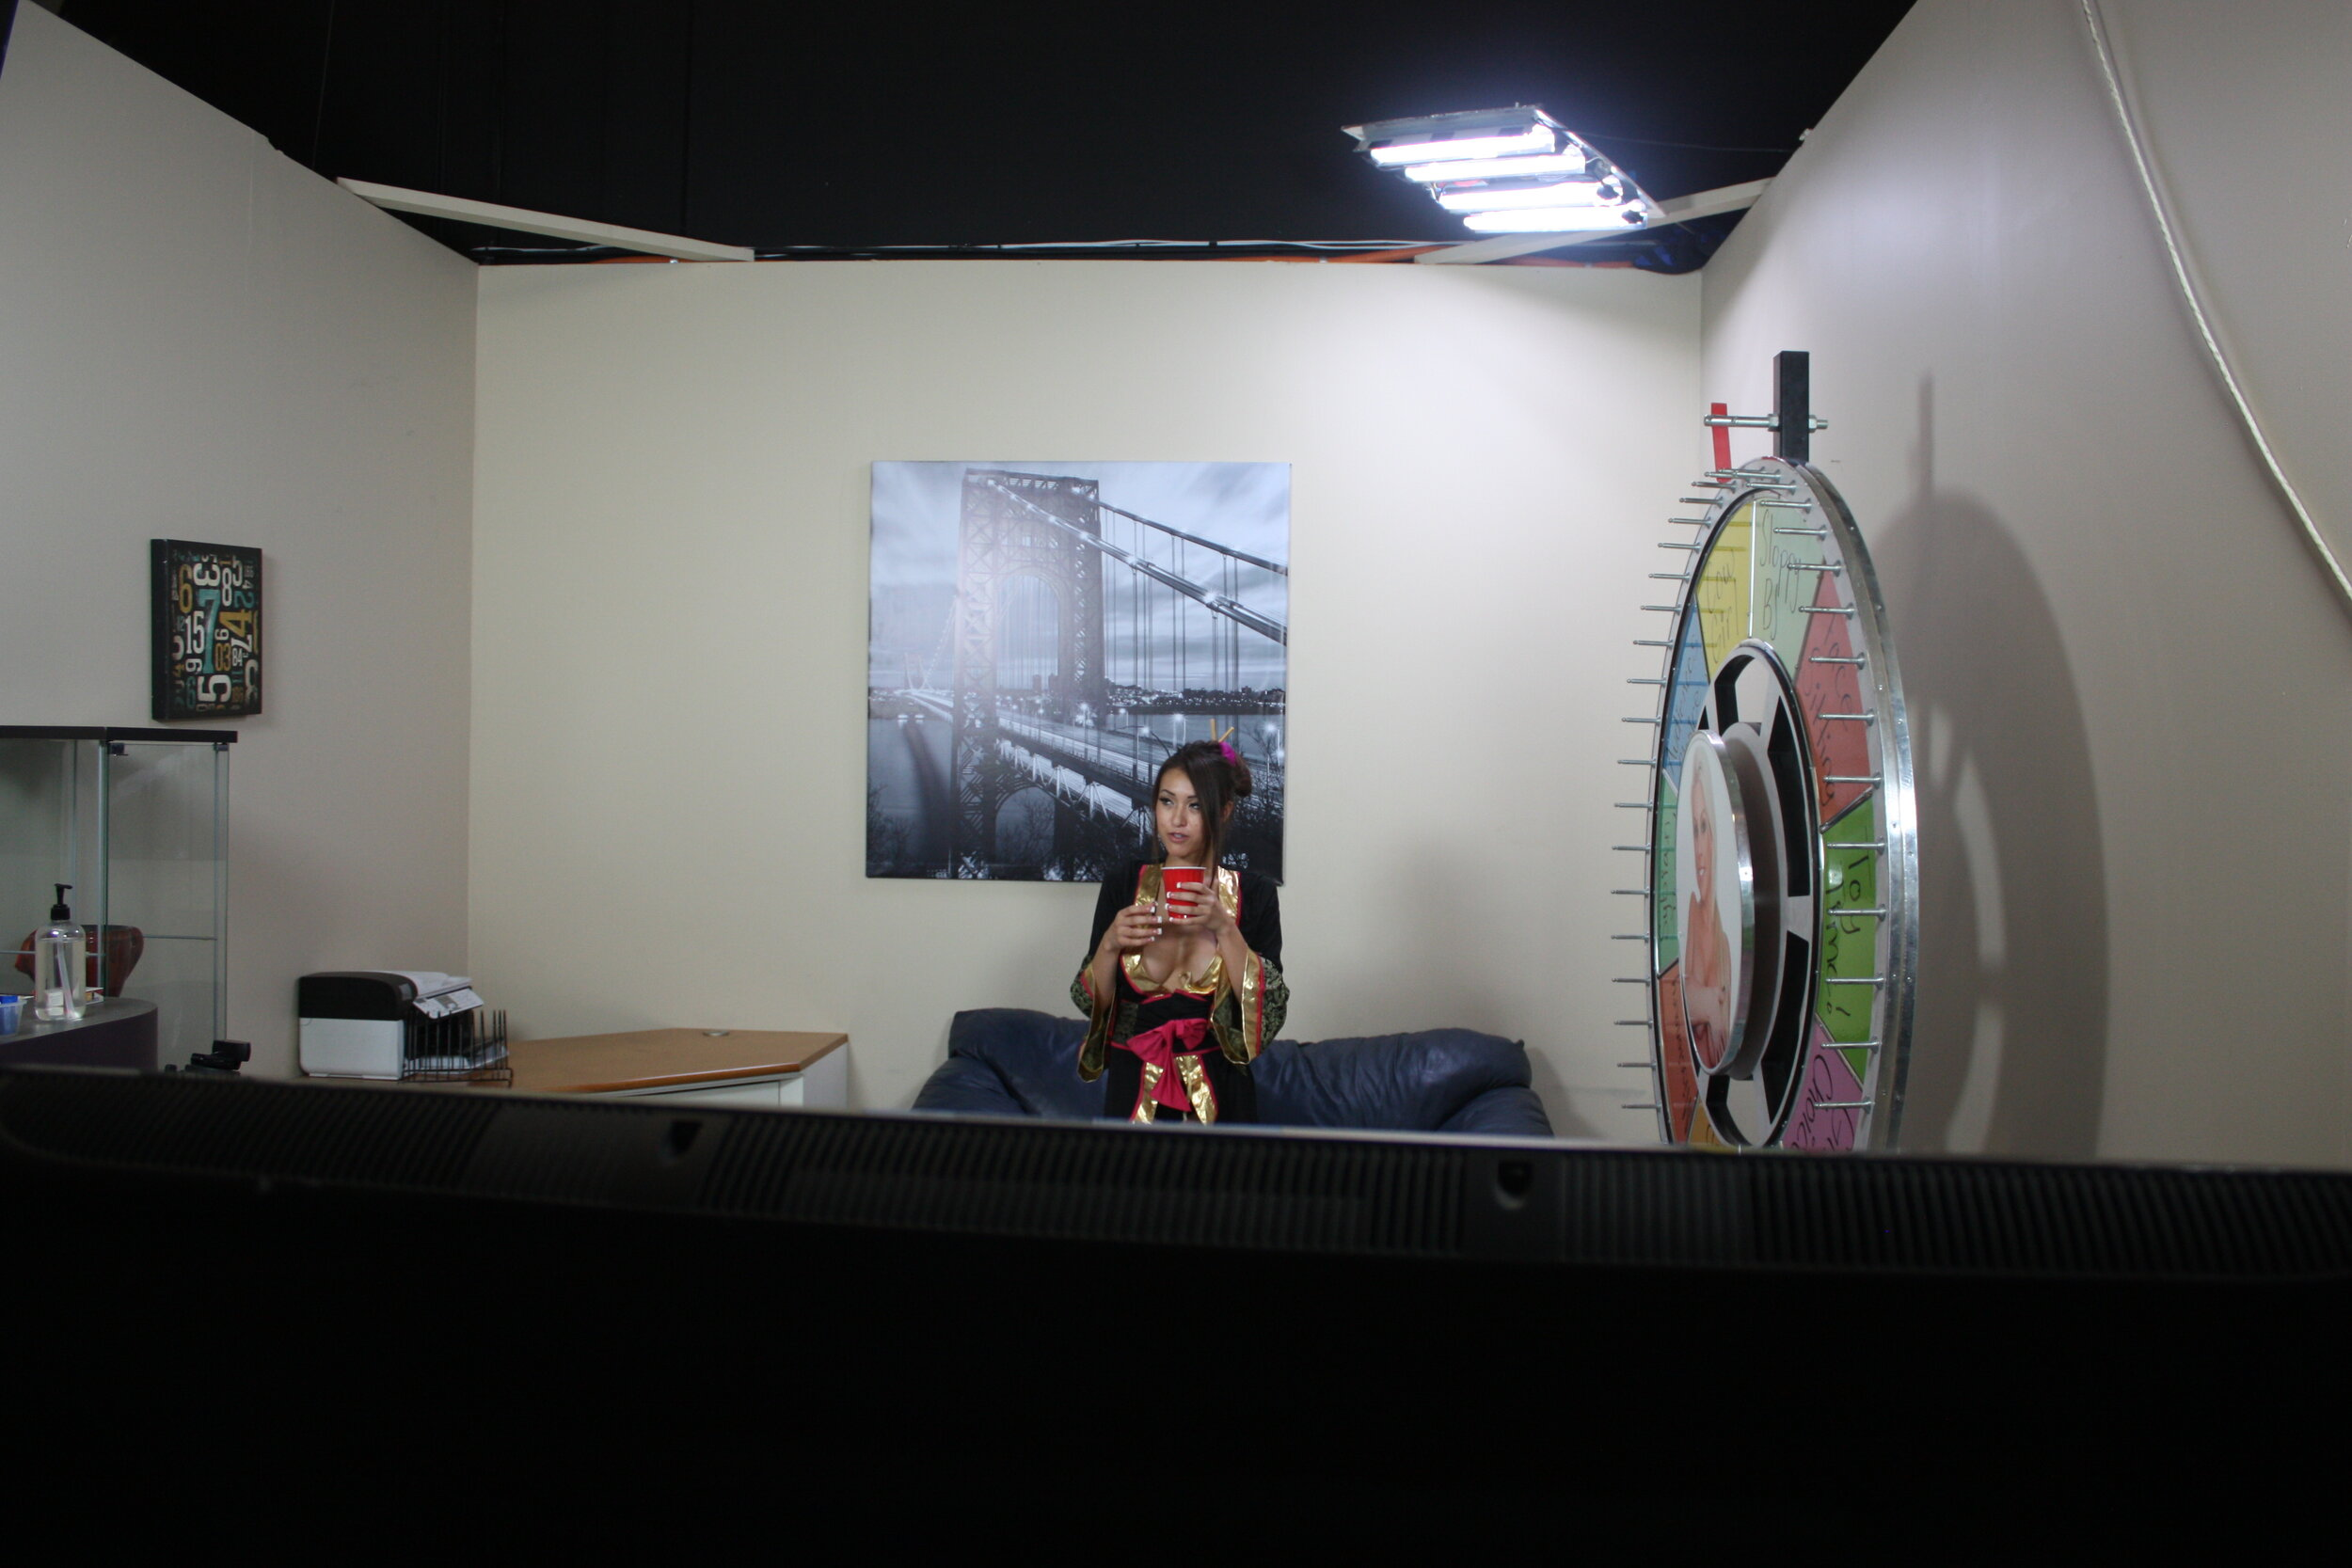 Porn Set, 2014